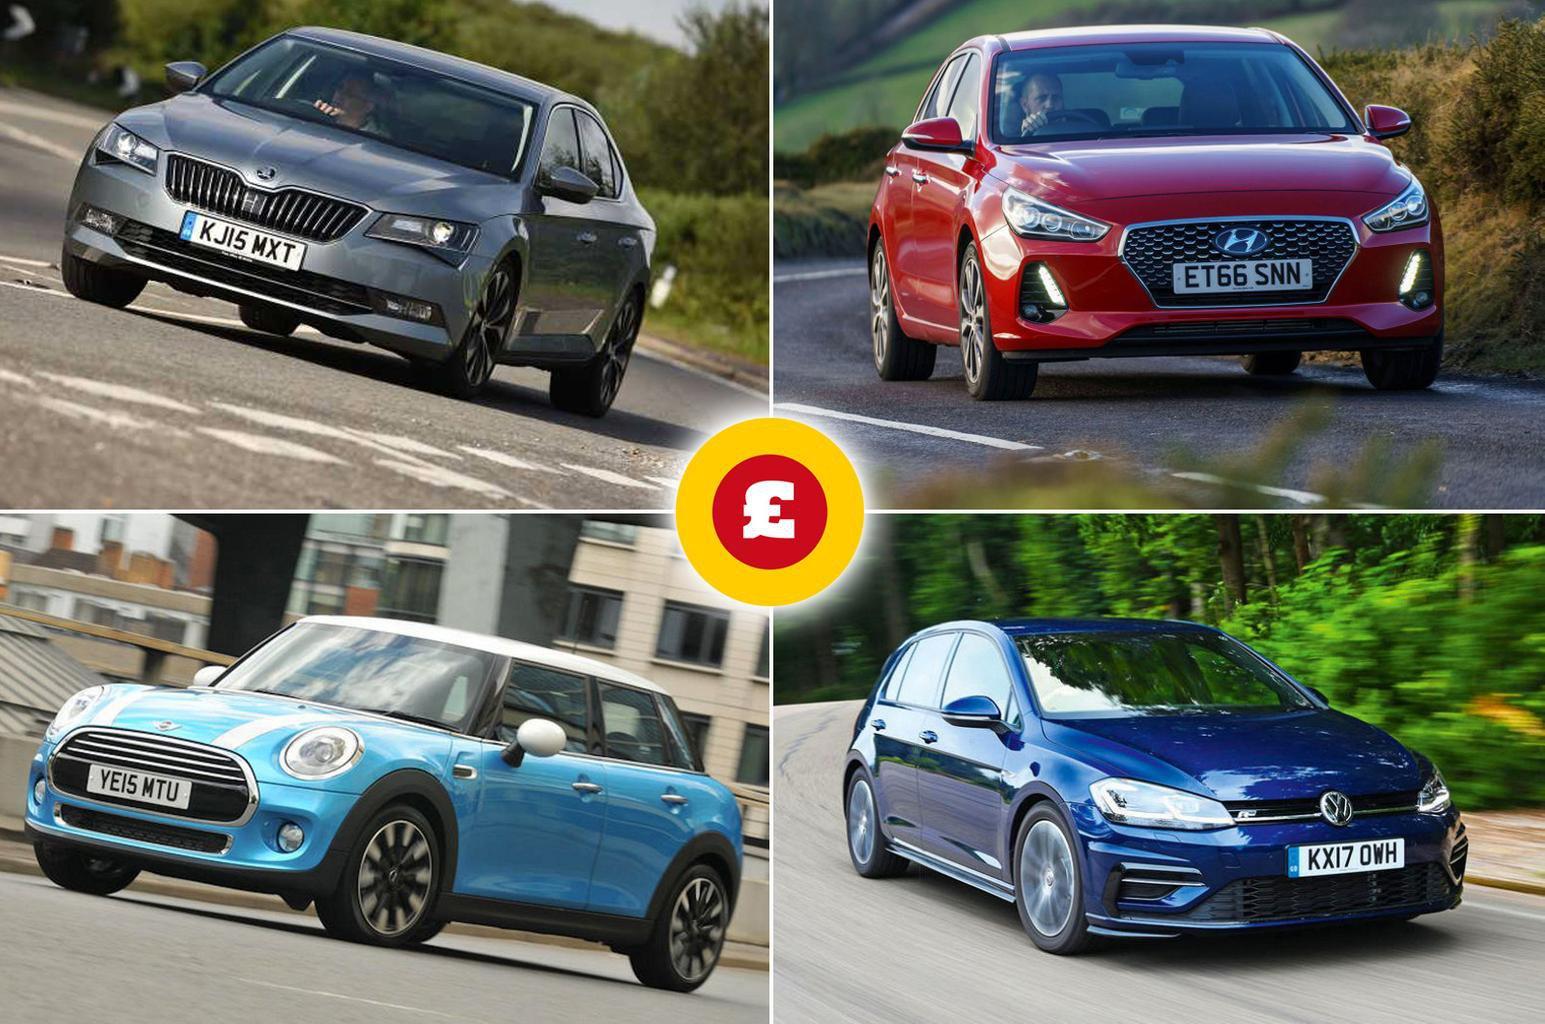 Car Lease Deals Near Me >> What Car Leasing Deals Of The Week What Car